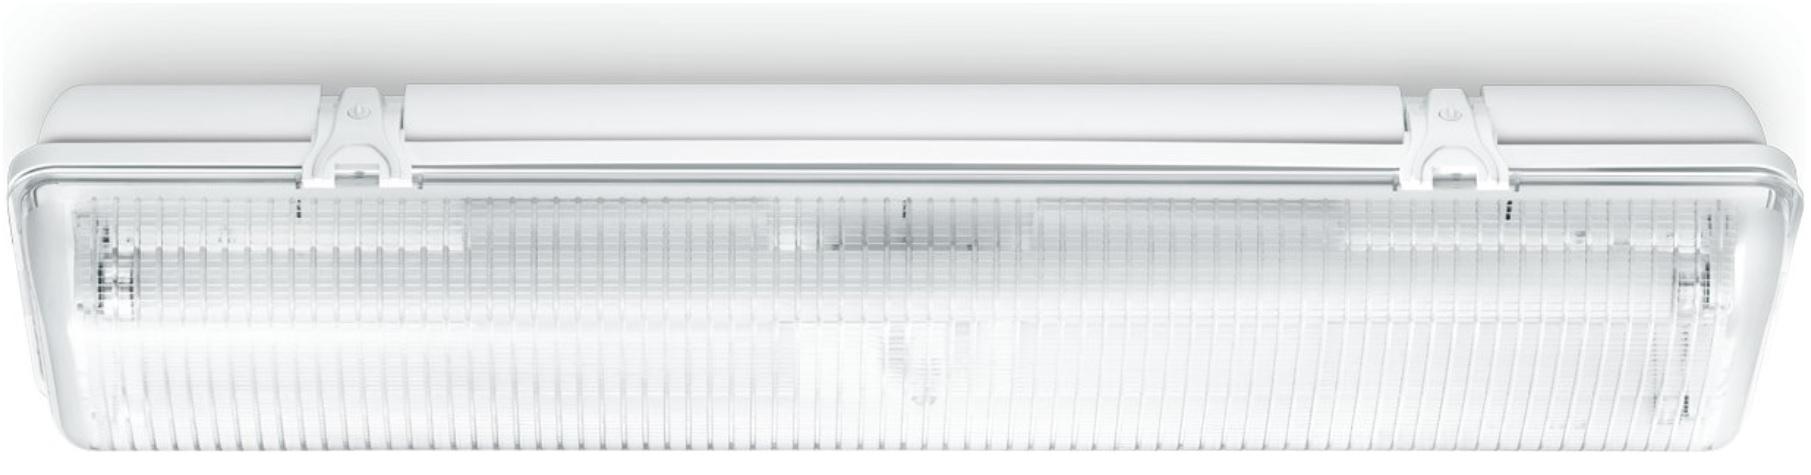 Sensorlamp Steinel FRS30